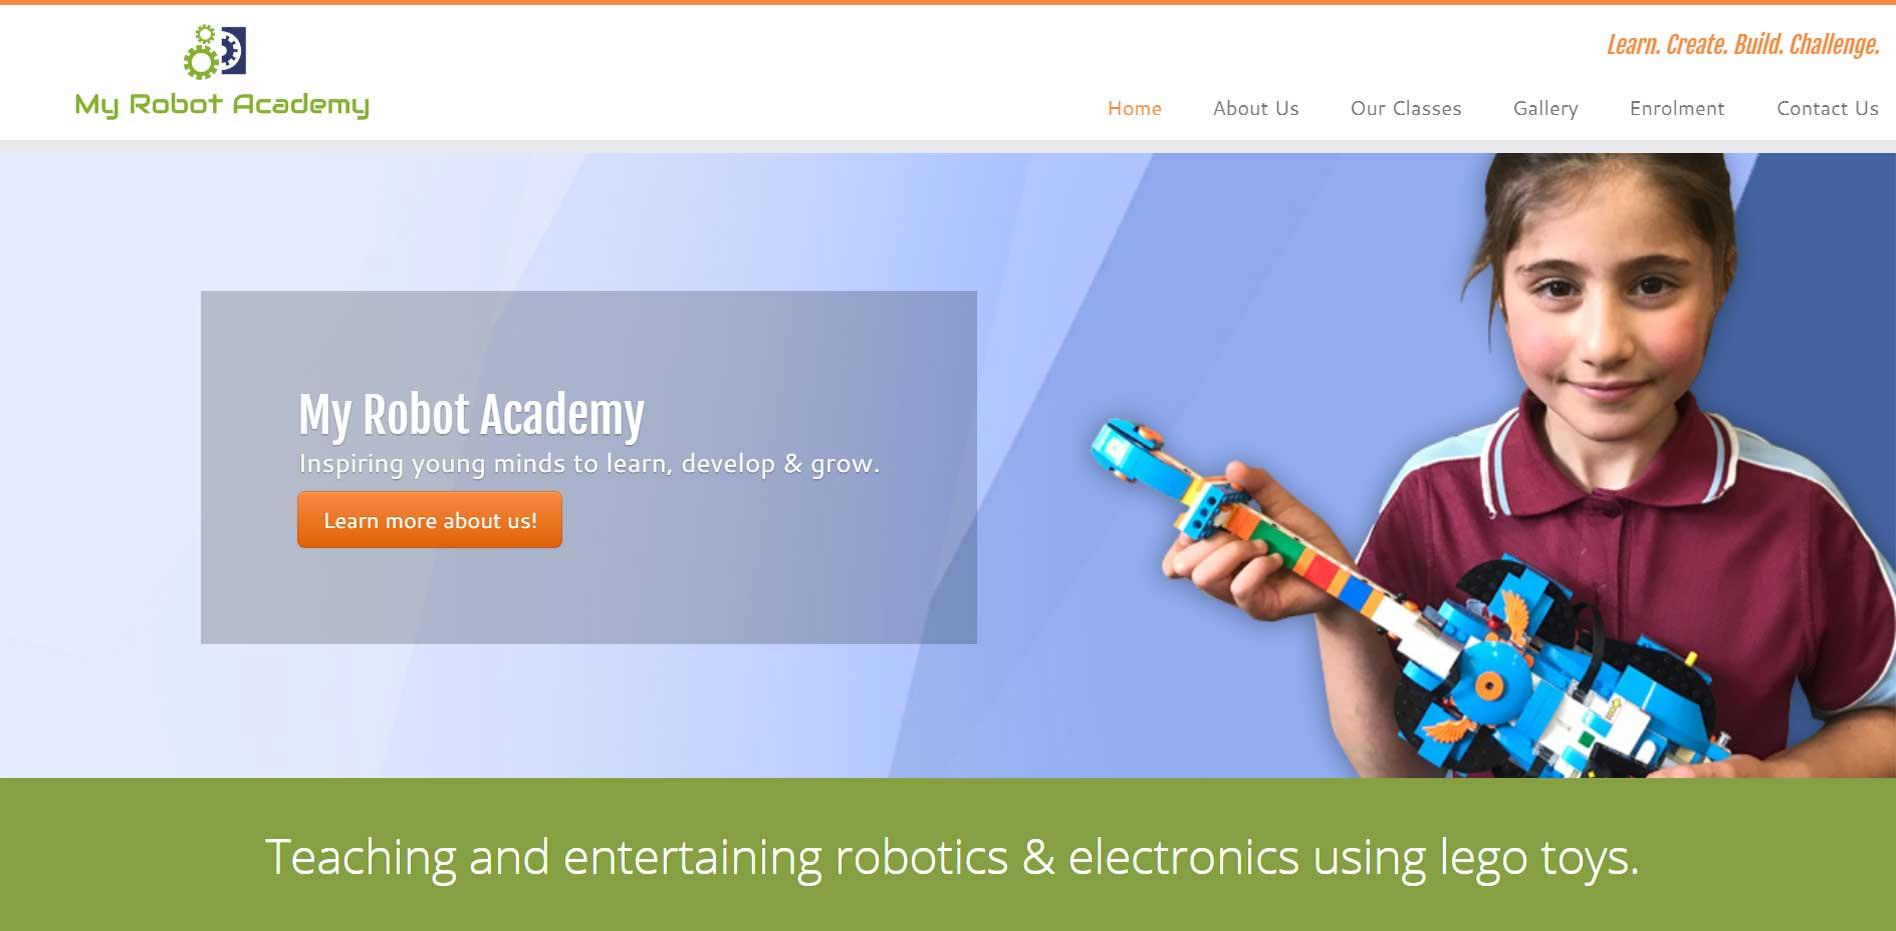 My Robot Academy